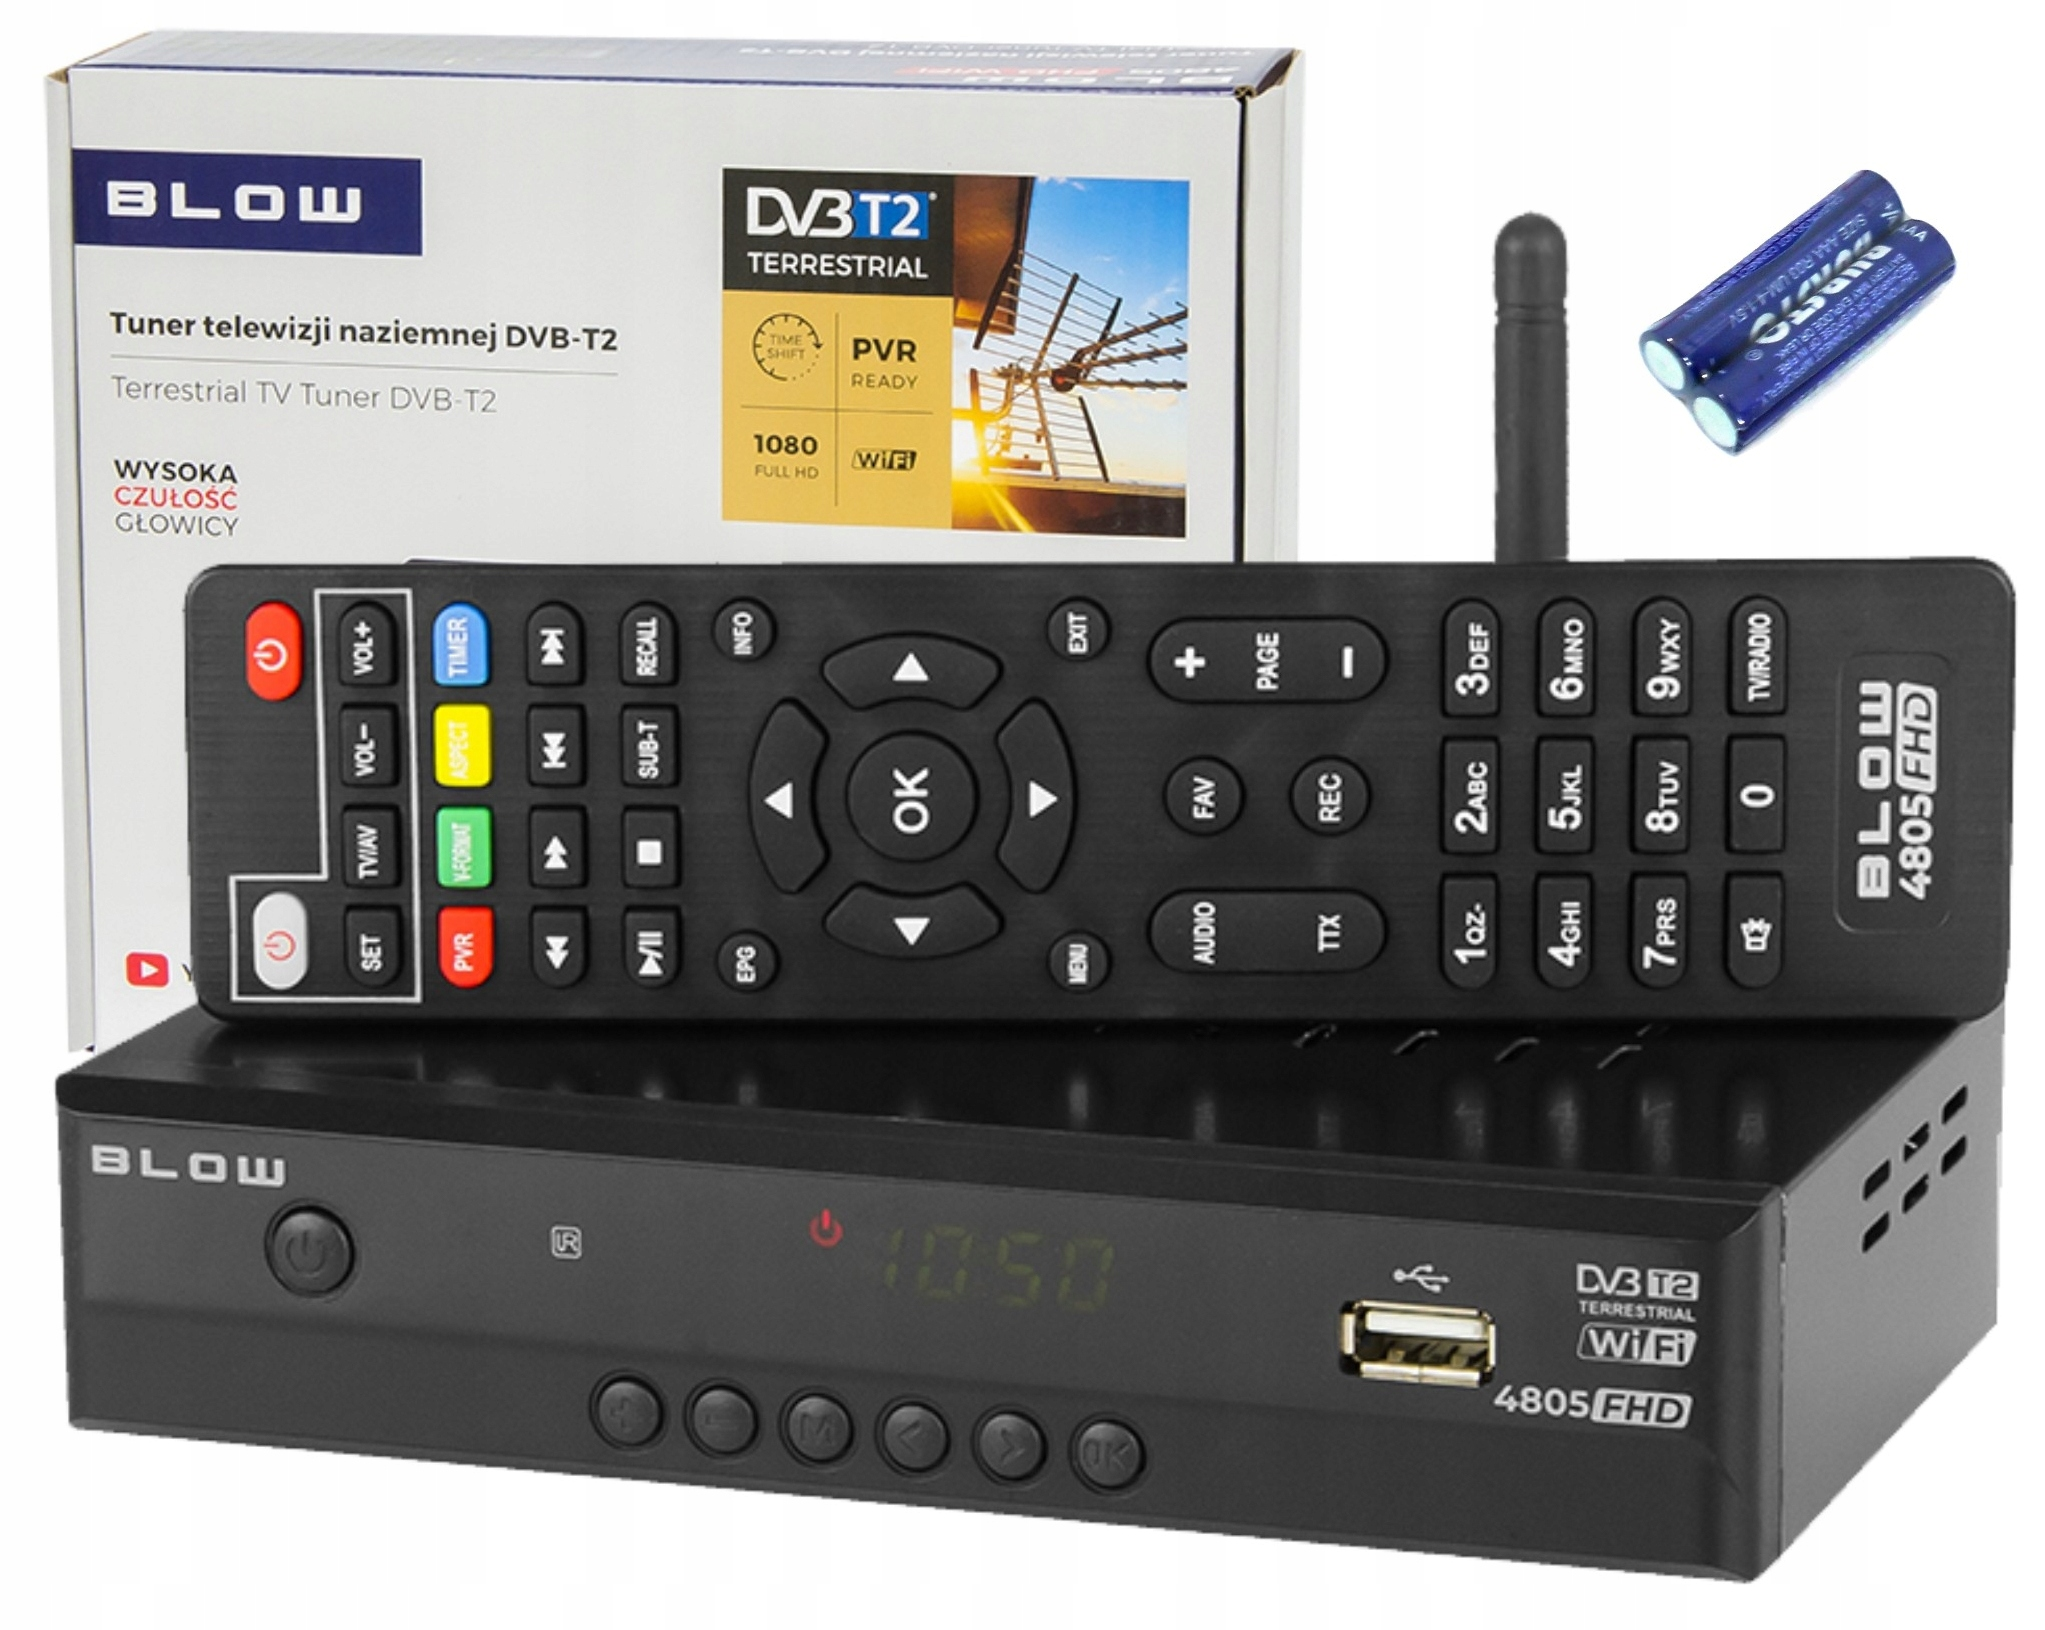 TUNER DVB-T DEKODER CYFROWY TV DVB-T2 PVR Wi-Fi 9044550572 - Sklep internetowy AGD, RTV, telefony, laptopy - Allegro.pl